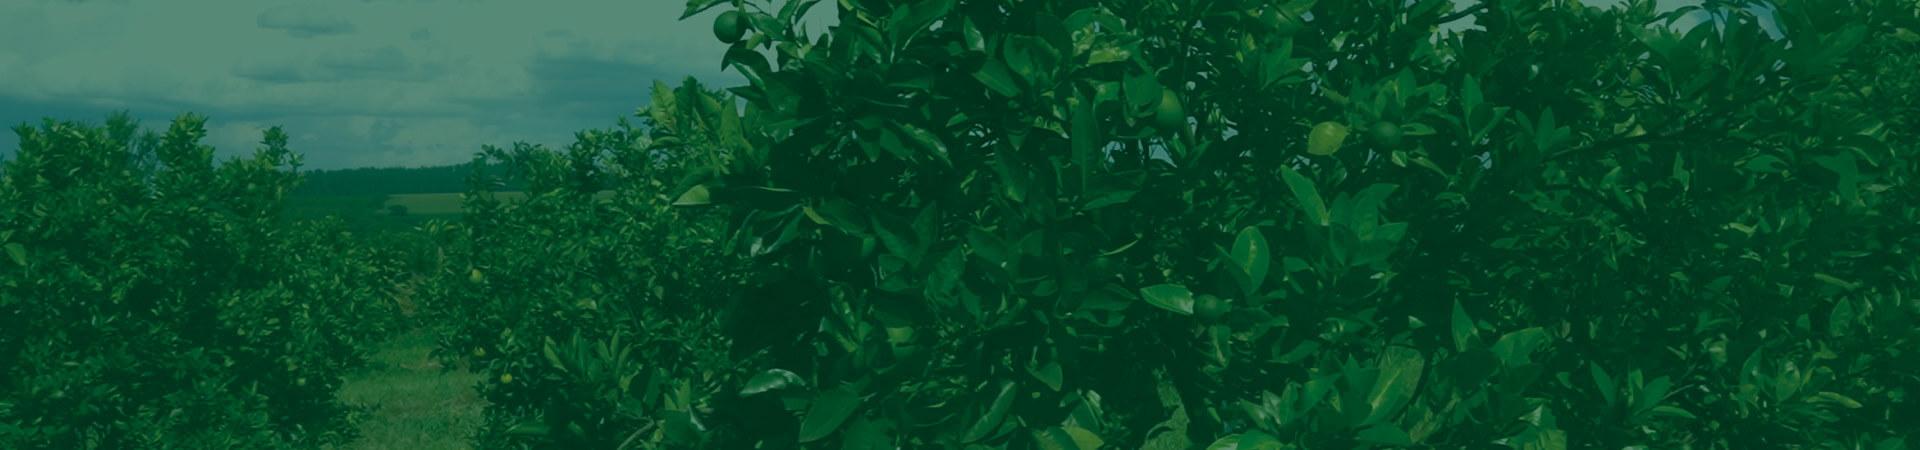 Psilídeo dos citros – O maior desafio da citricultura